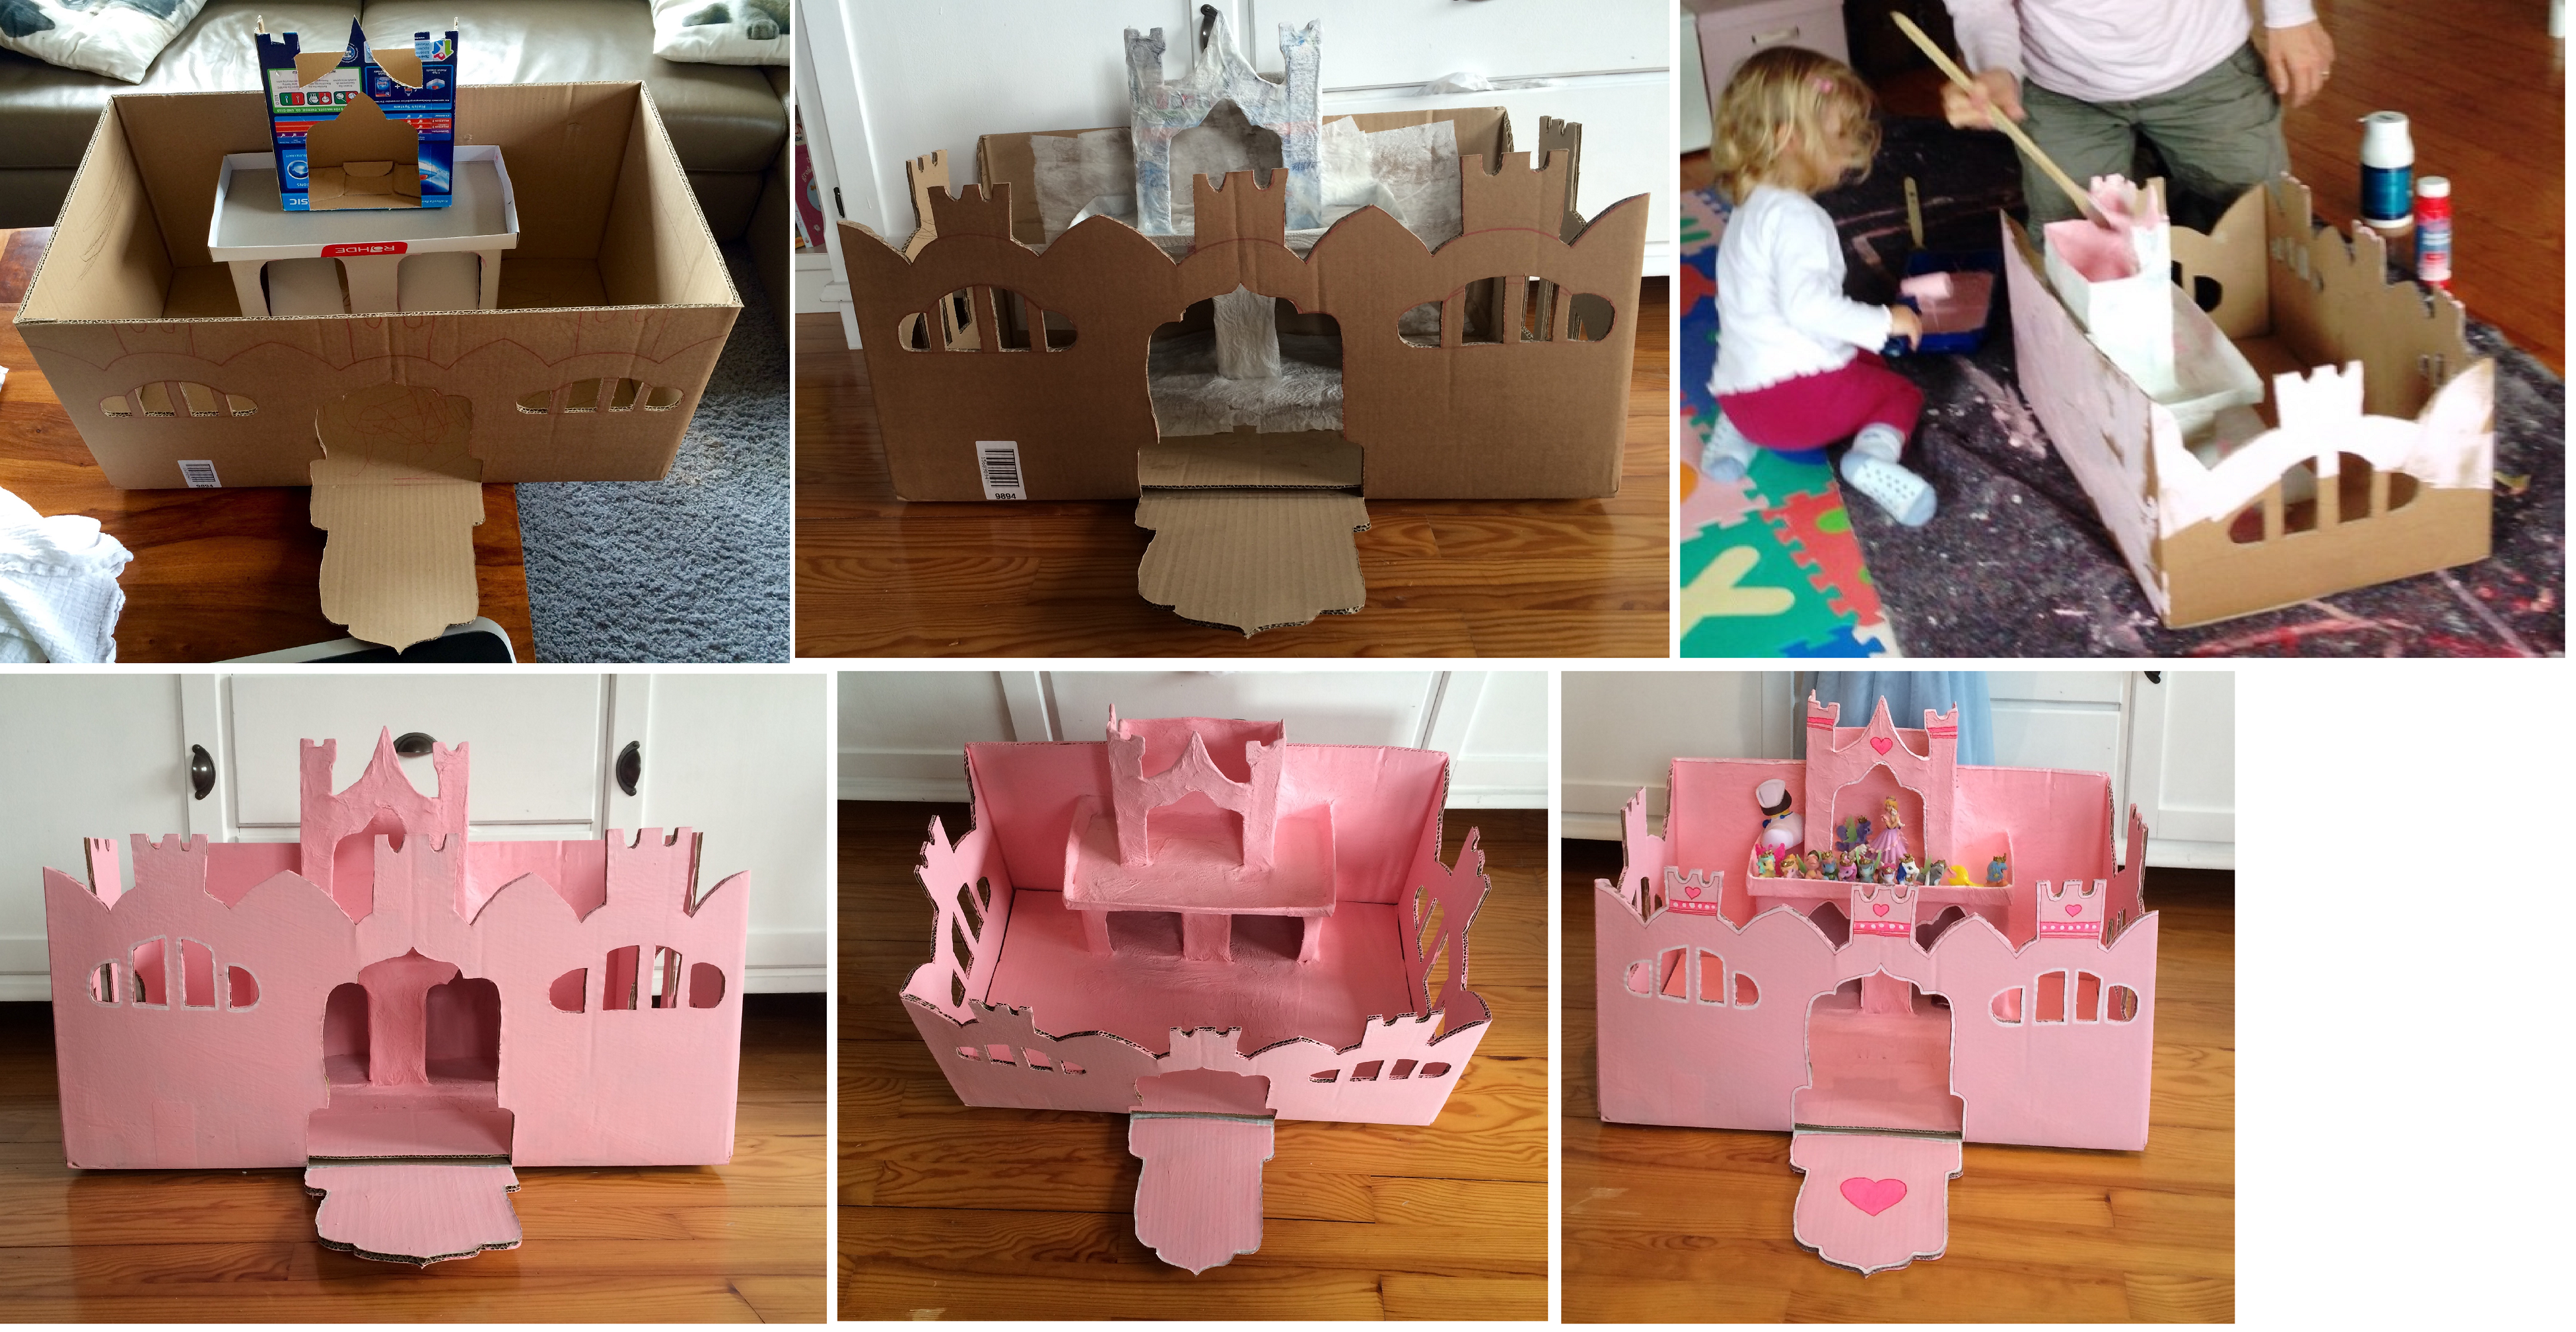 Ein Schloss Aus Karton Schloss Aus Karton Karton